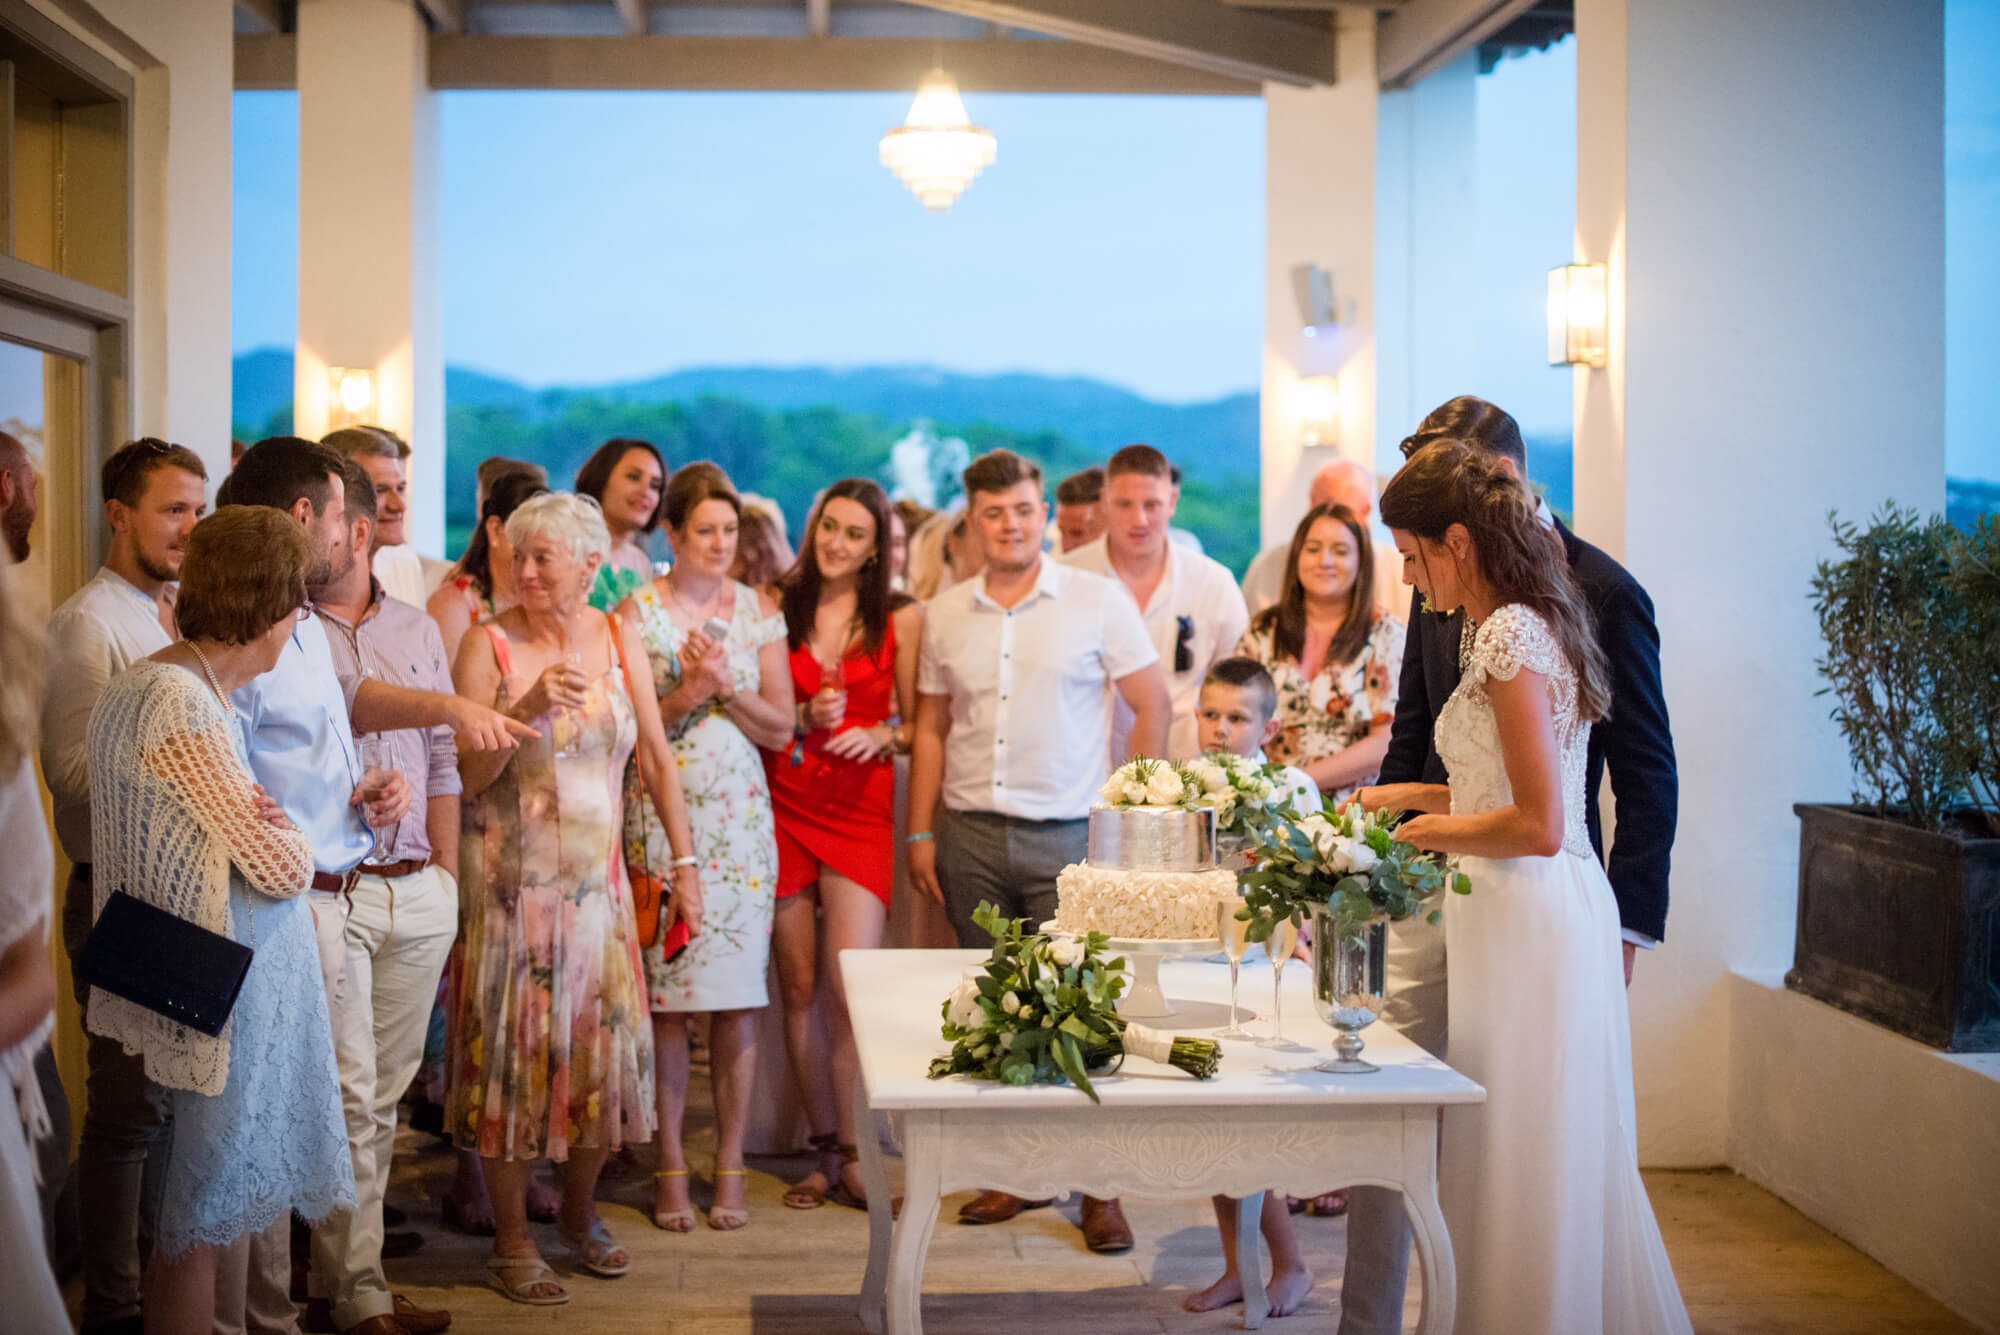 bride groom silver wedding cake cutting dusk light sunset venue